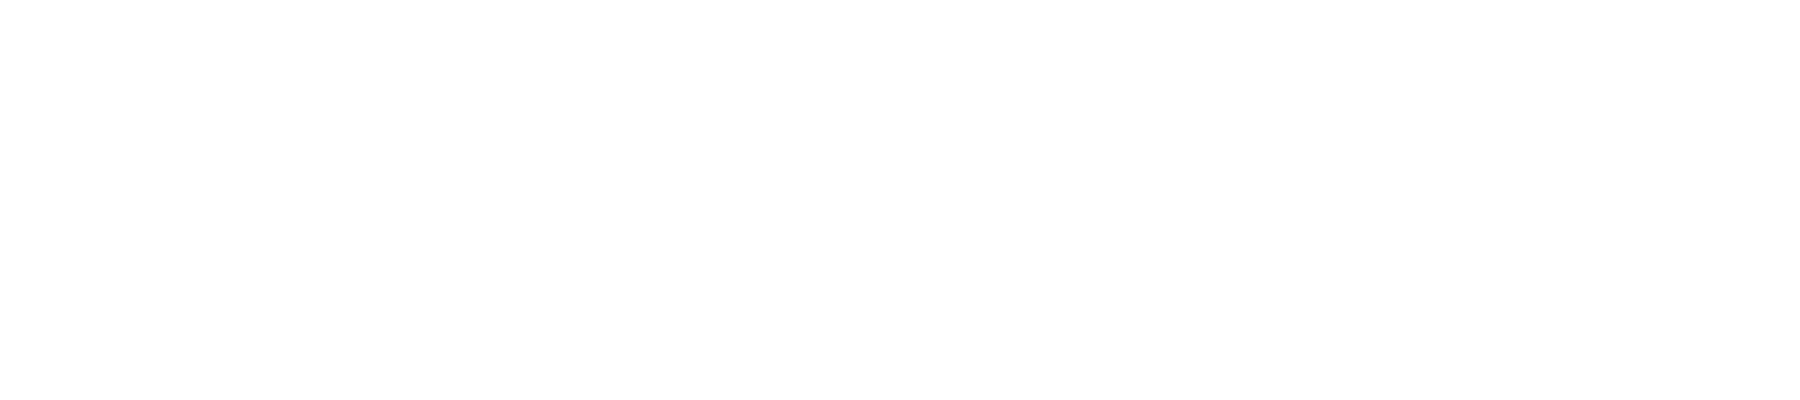 White Heart Background